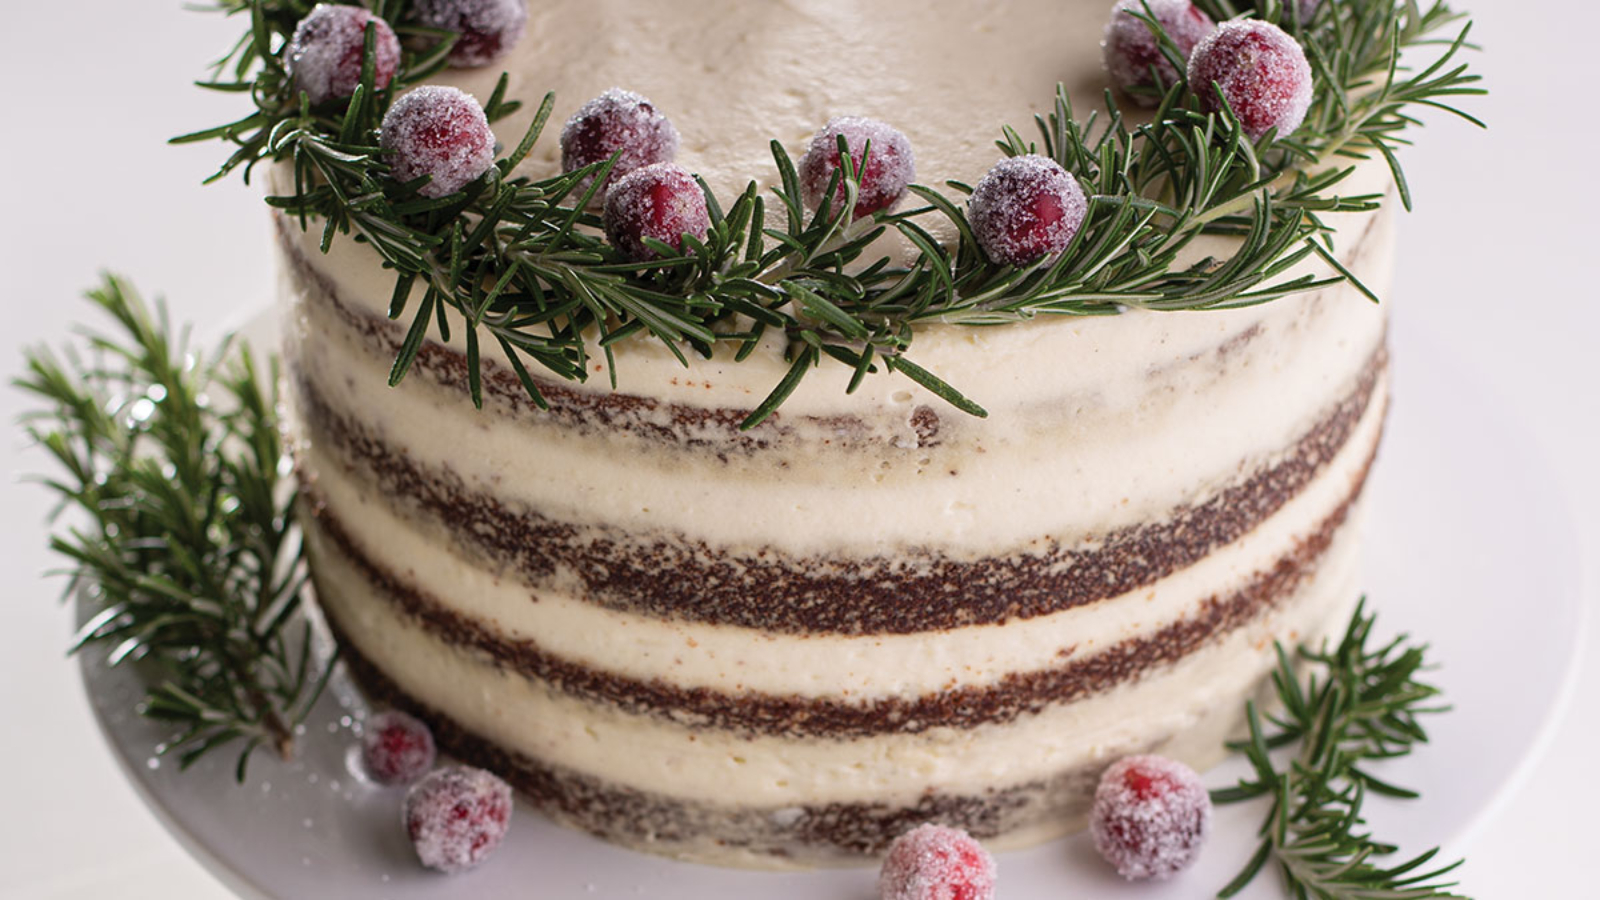 Diskont-Stanic-Recept-Svecana-torta-cover